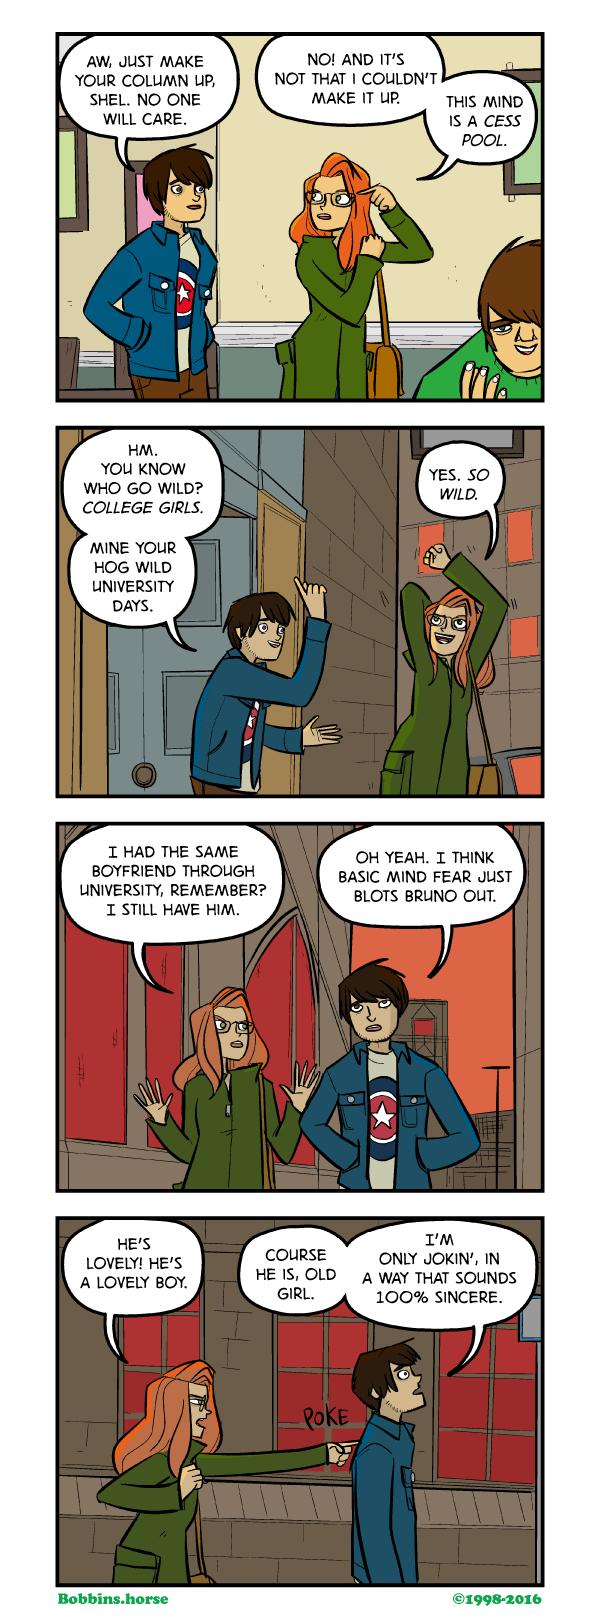 2016-04-04